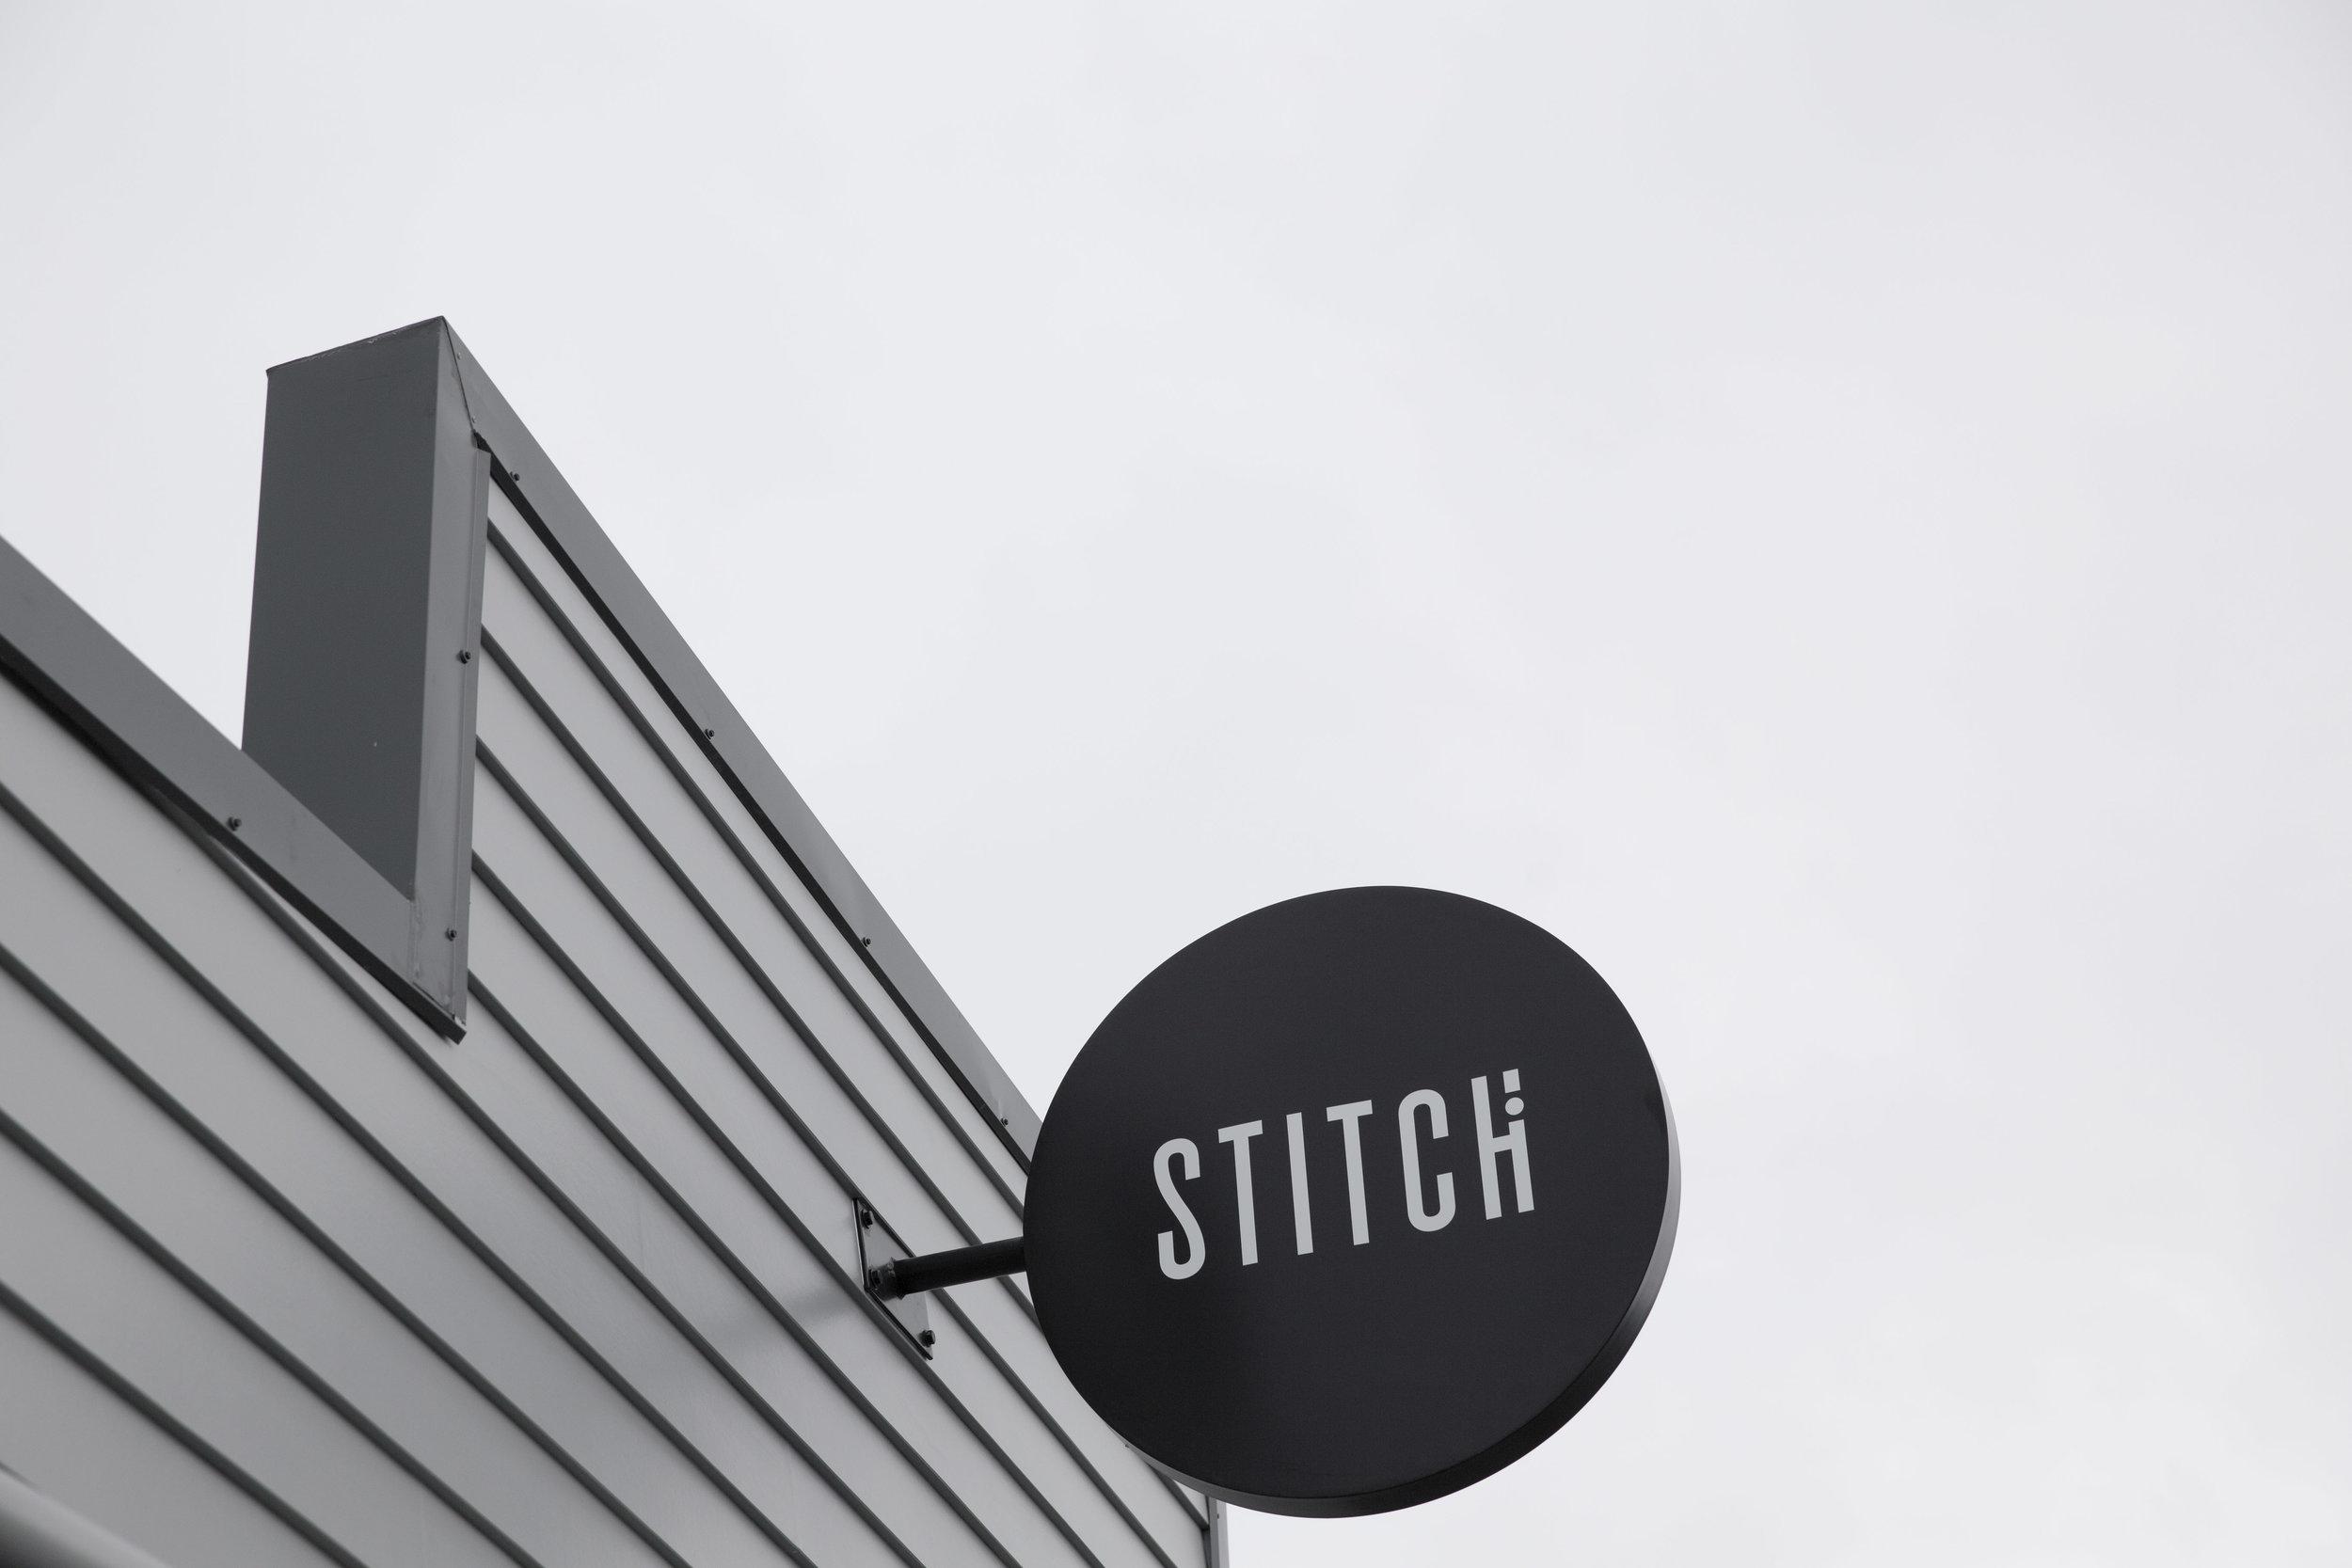 stitch (1 of 50).jpg .jpg